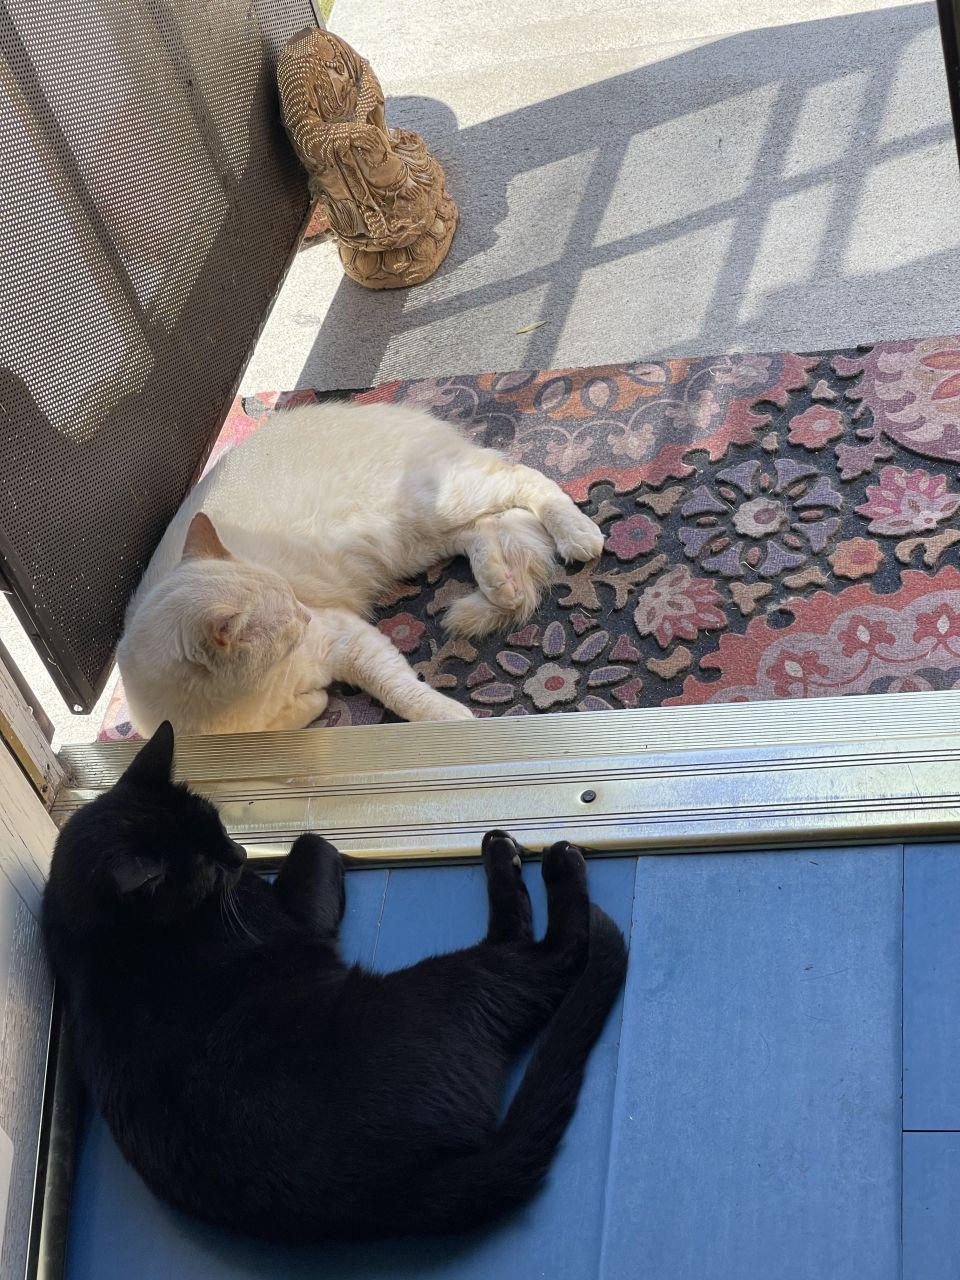 Matter and Anti-Matter, don't touch kitties!!!!